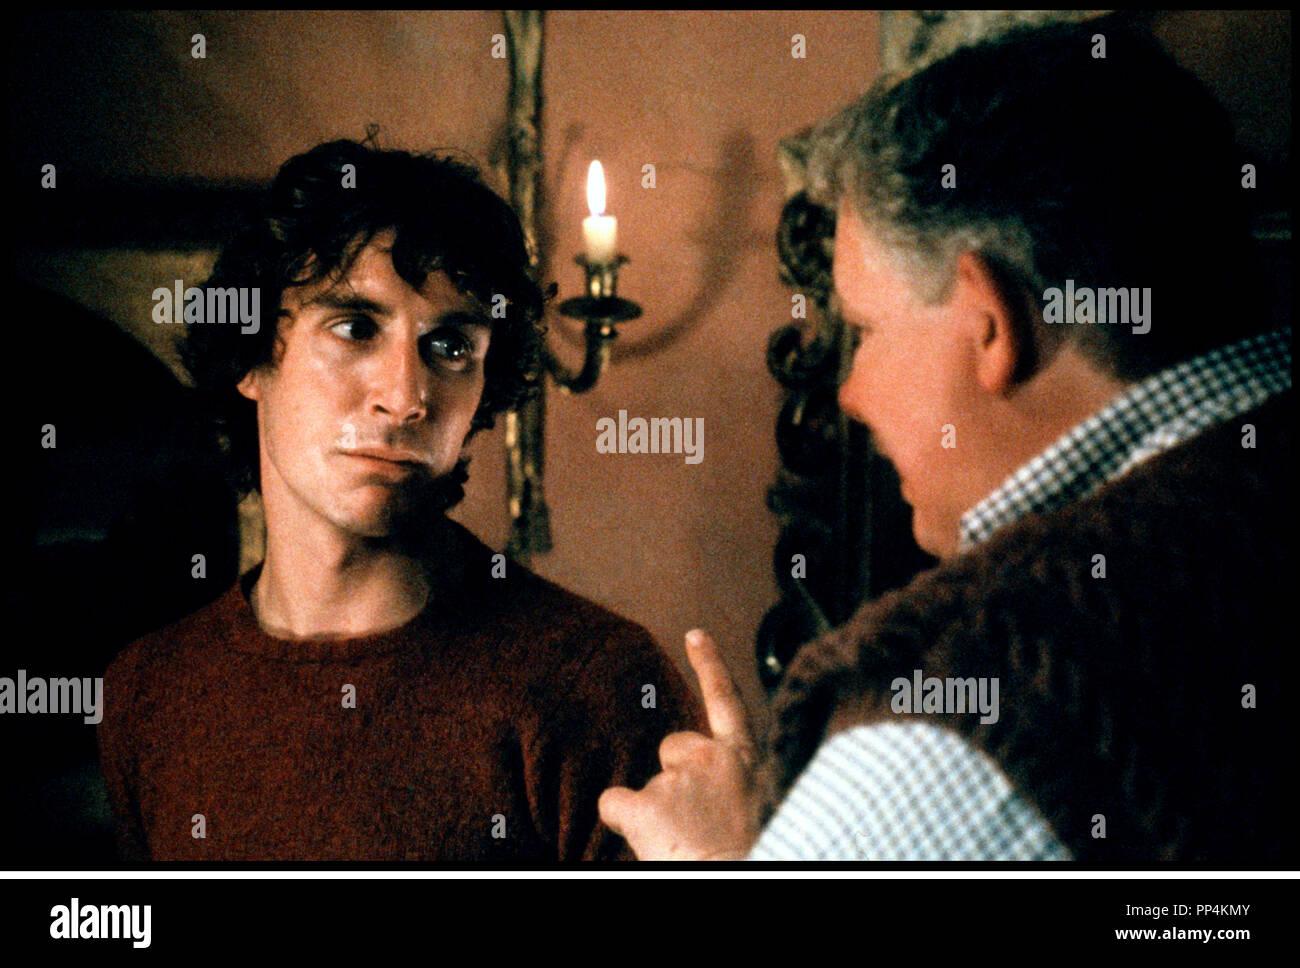 Prod DB © Handmade Films / DR WITHNAIL ET MOI (WITHNAIL & I) de Bruce Robinson 1987 GB avertissement, intimidation, - Stock Image